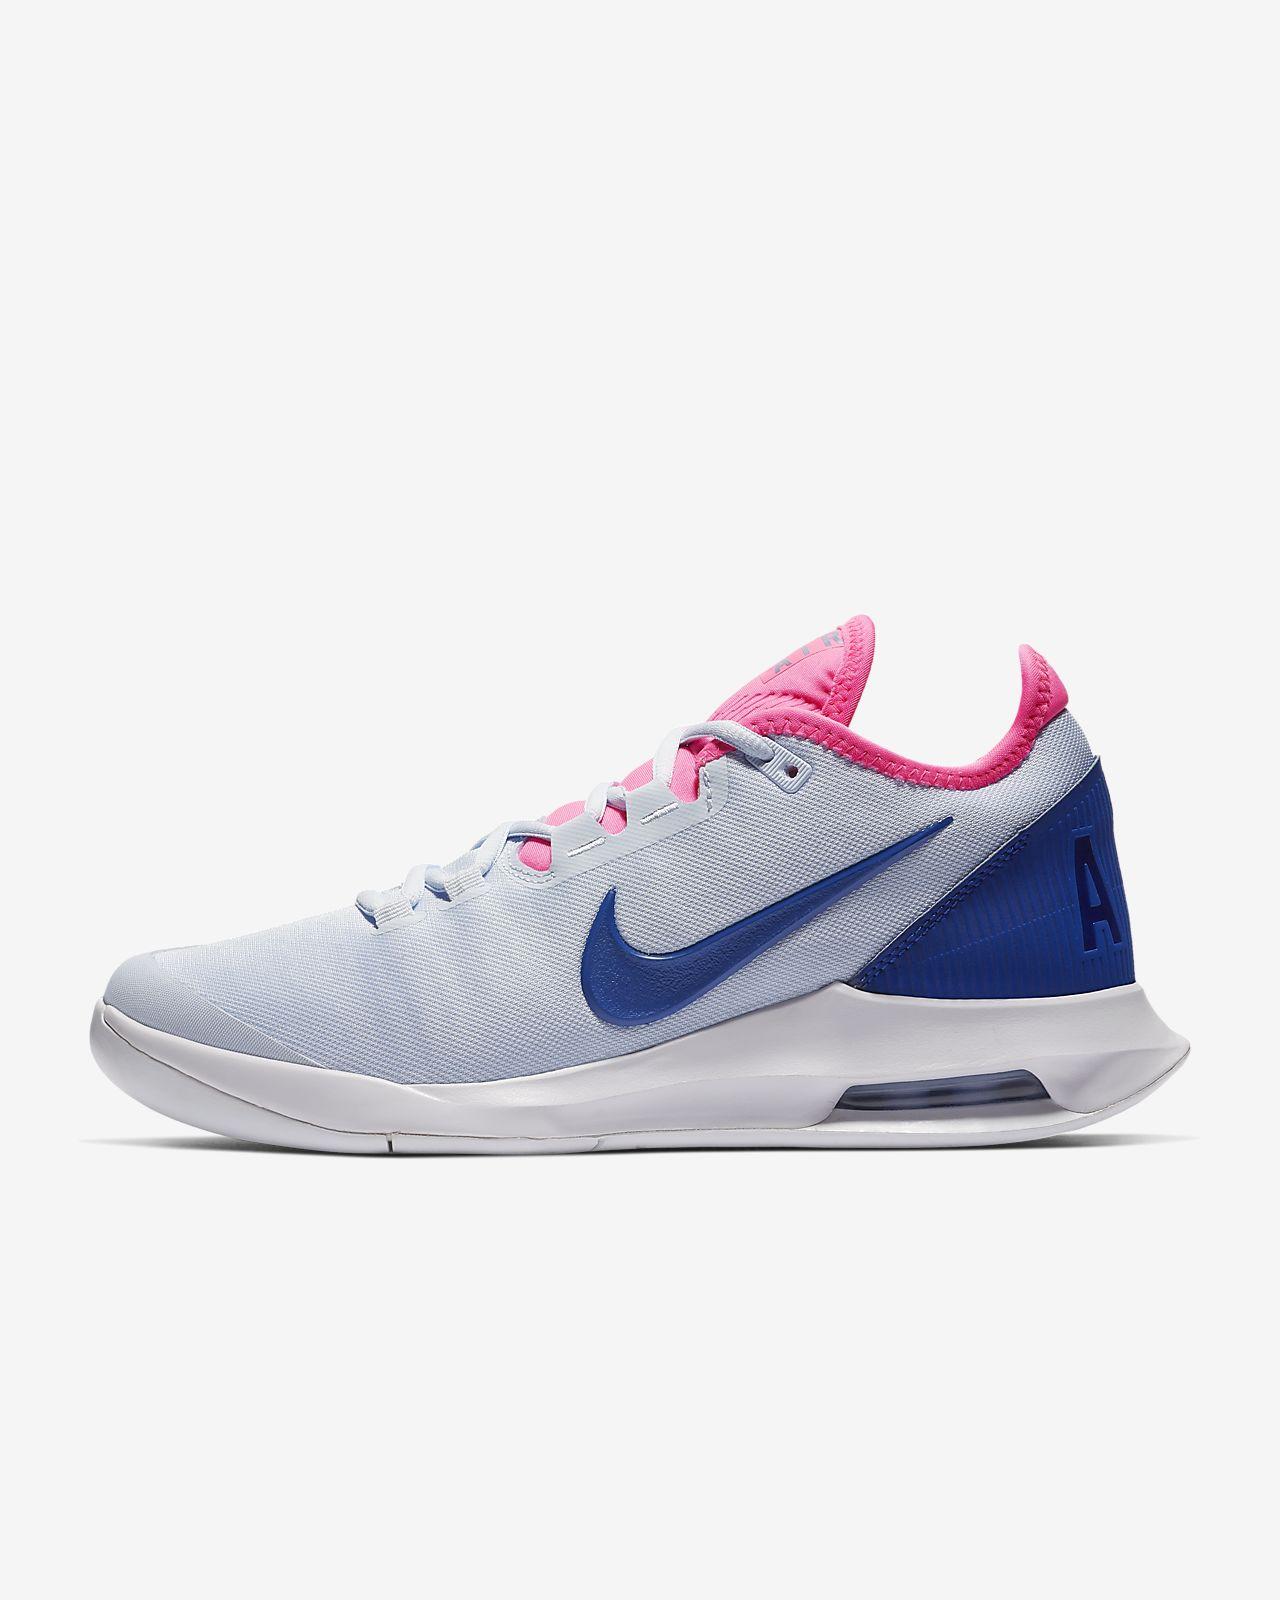 105ce6d7c4f9 NikeCourt Air Max Wildcard Women s Tennis Shoe. Nike.com DK